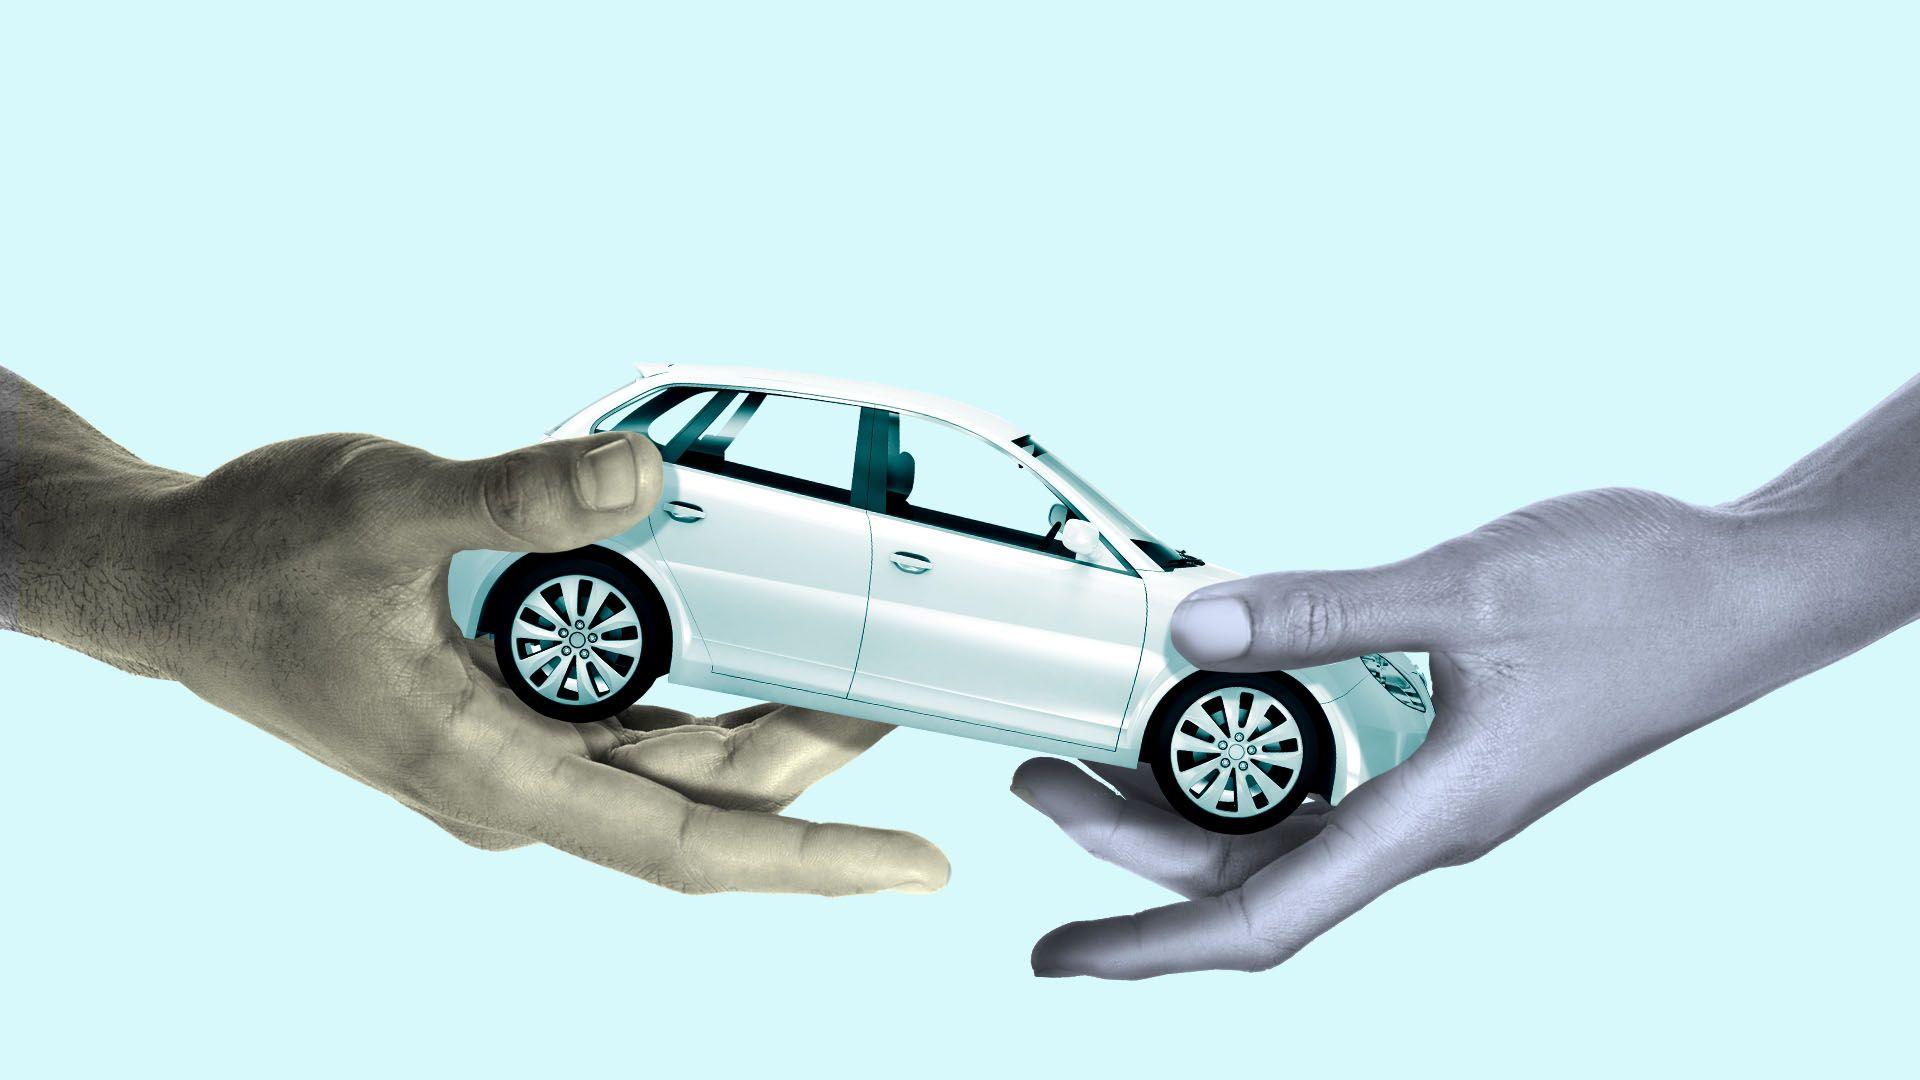 Car loans are dragging Americans underwater - Axios